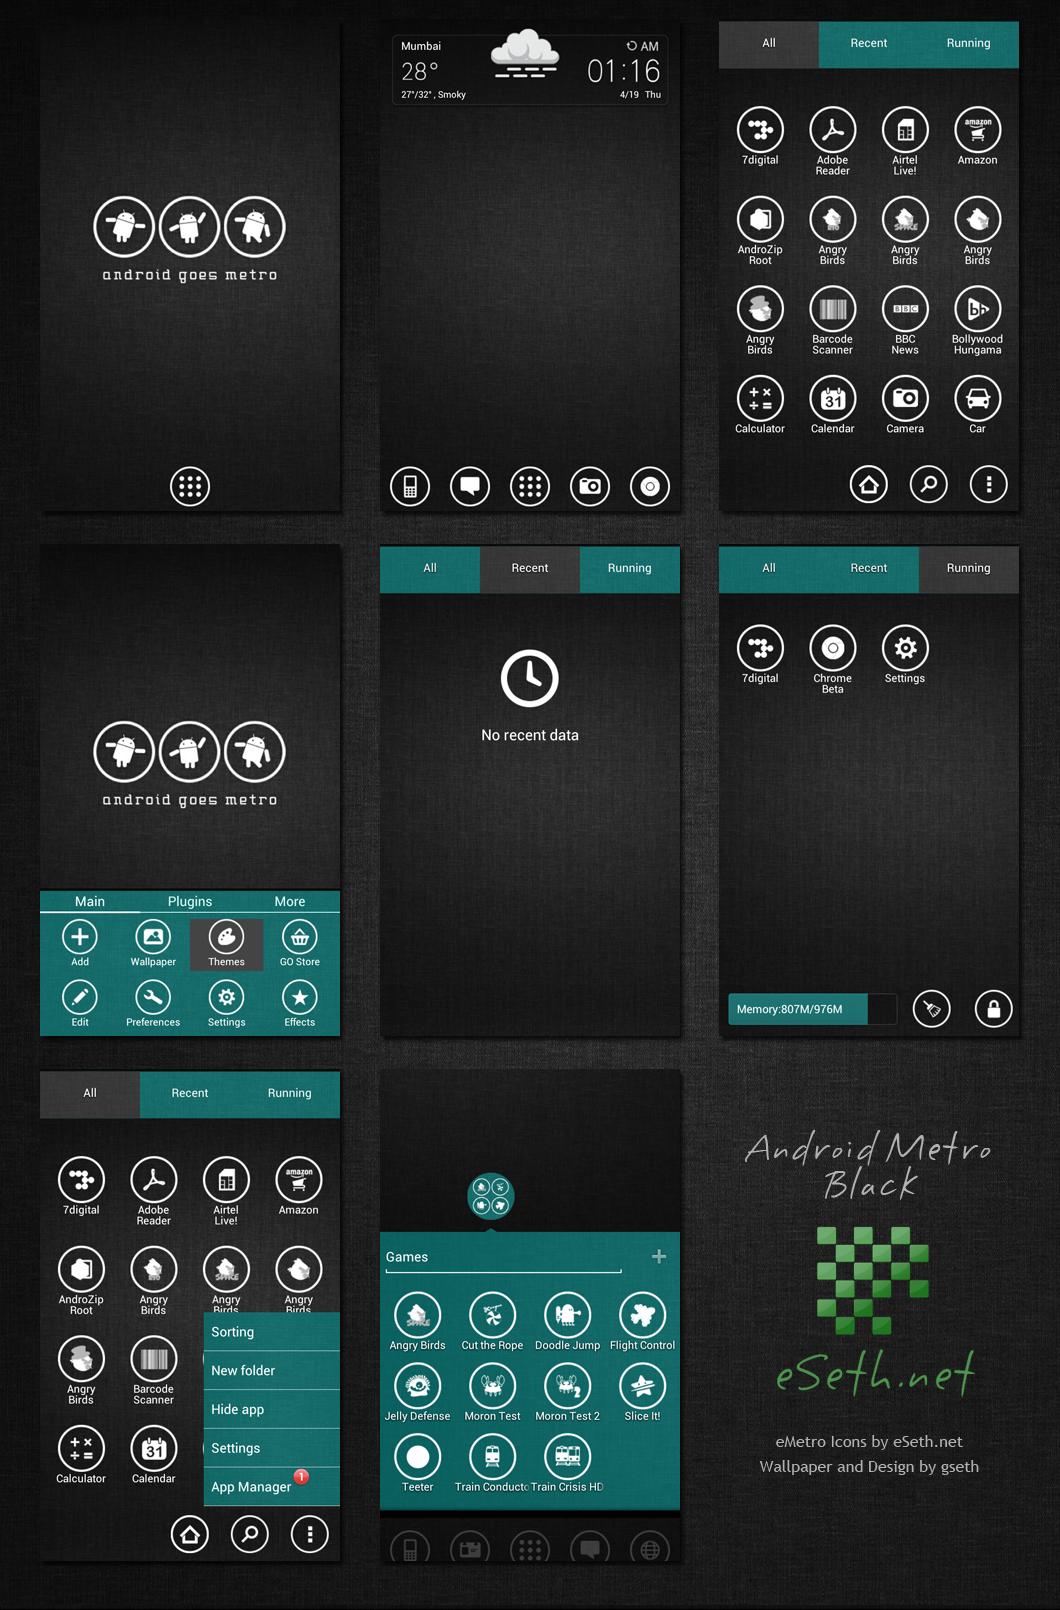 Metro Black Theme Android Go Launcher Ex